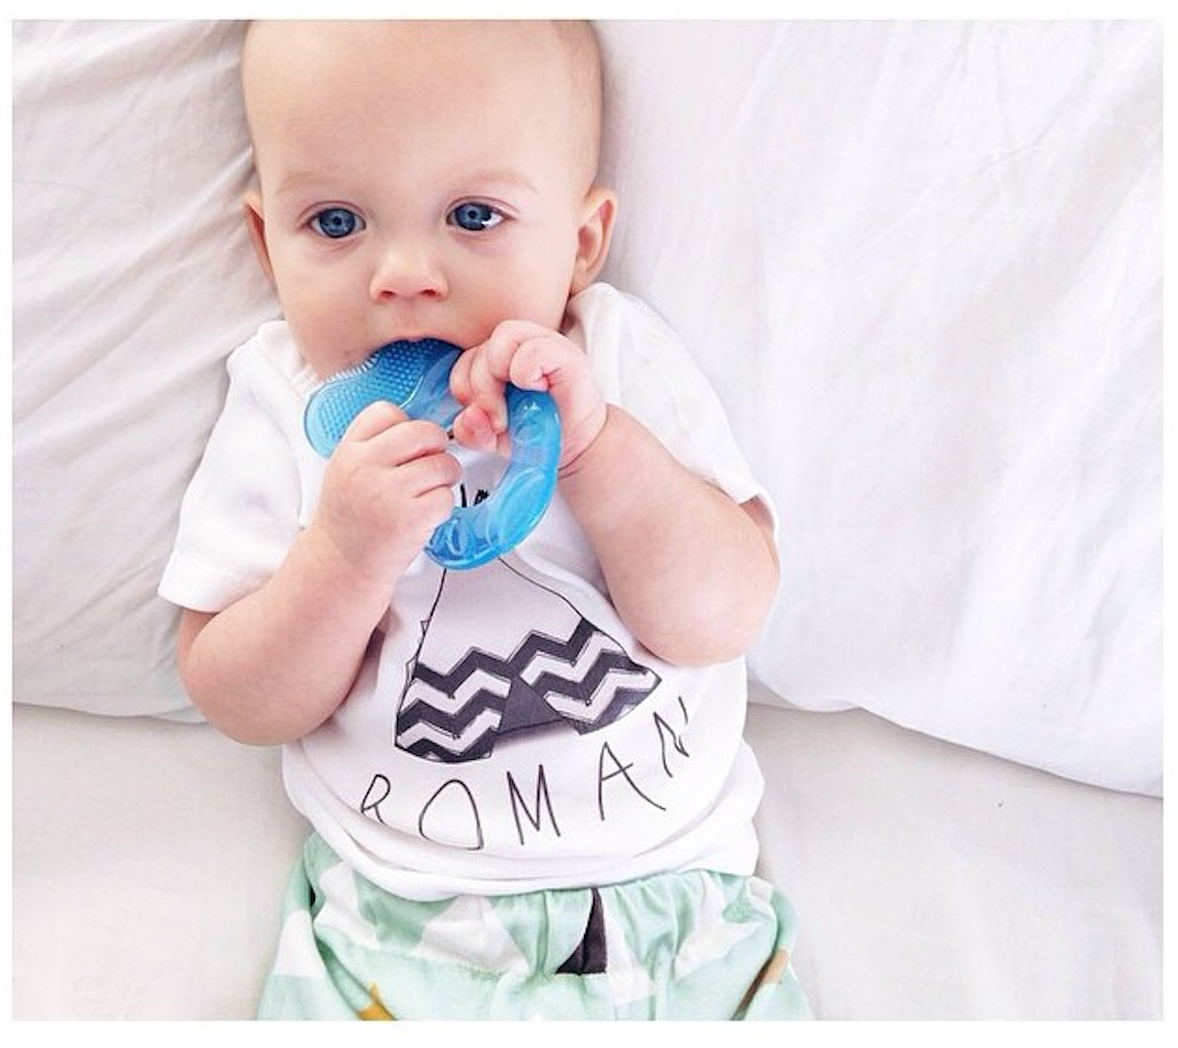 Roman in our Teepee Baby Name Tee (via Instagram @decriscio + @wordonbaby)